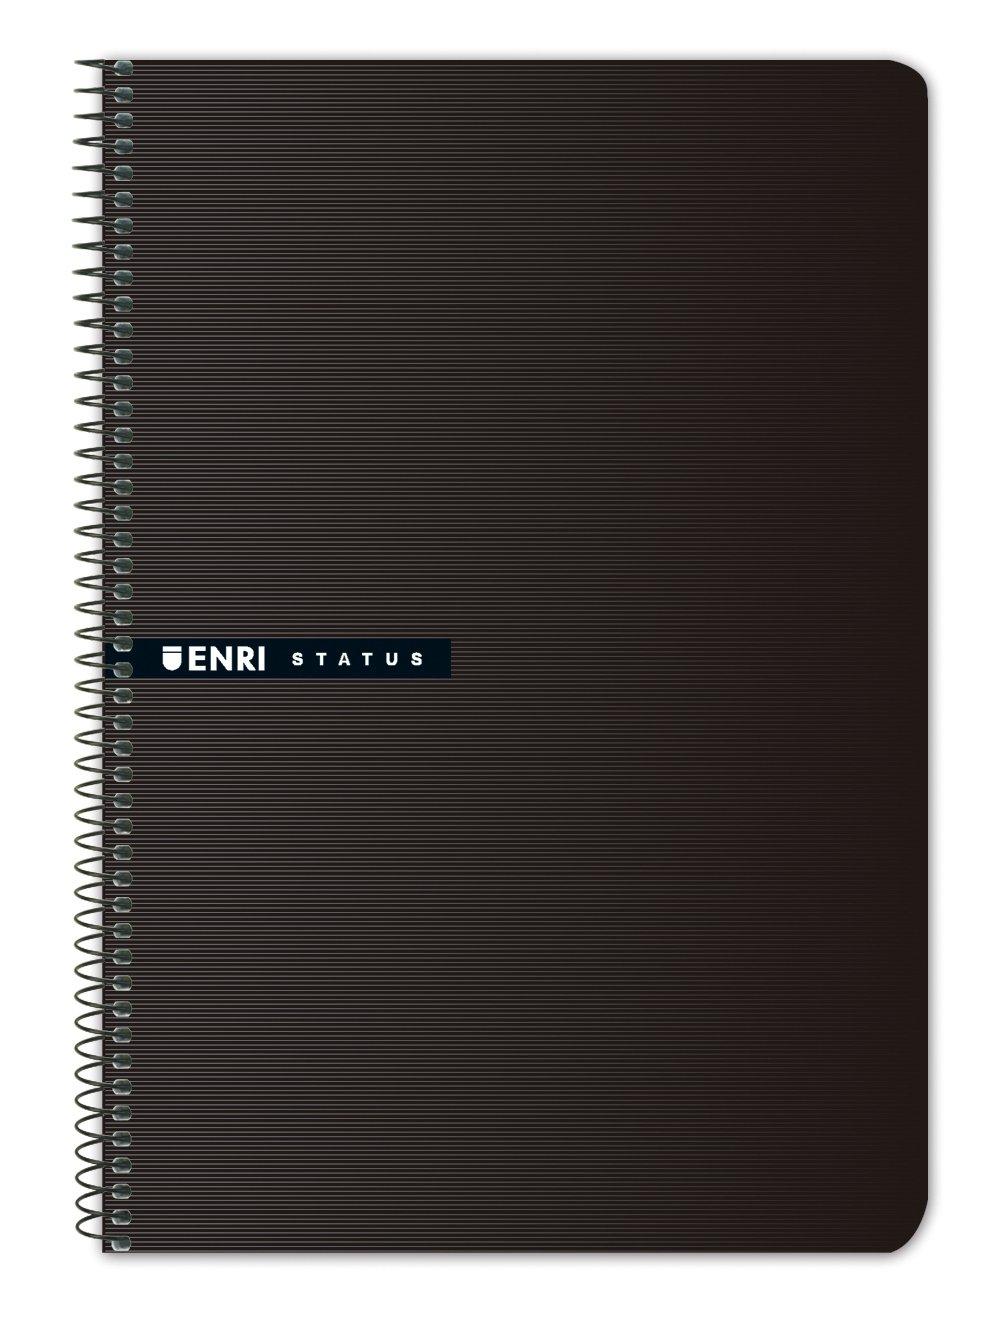 Enri 100435750–Pack of 5Notebooks Spiral Hardcover fº/215x 310mm, Black